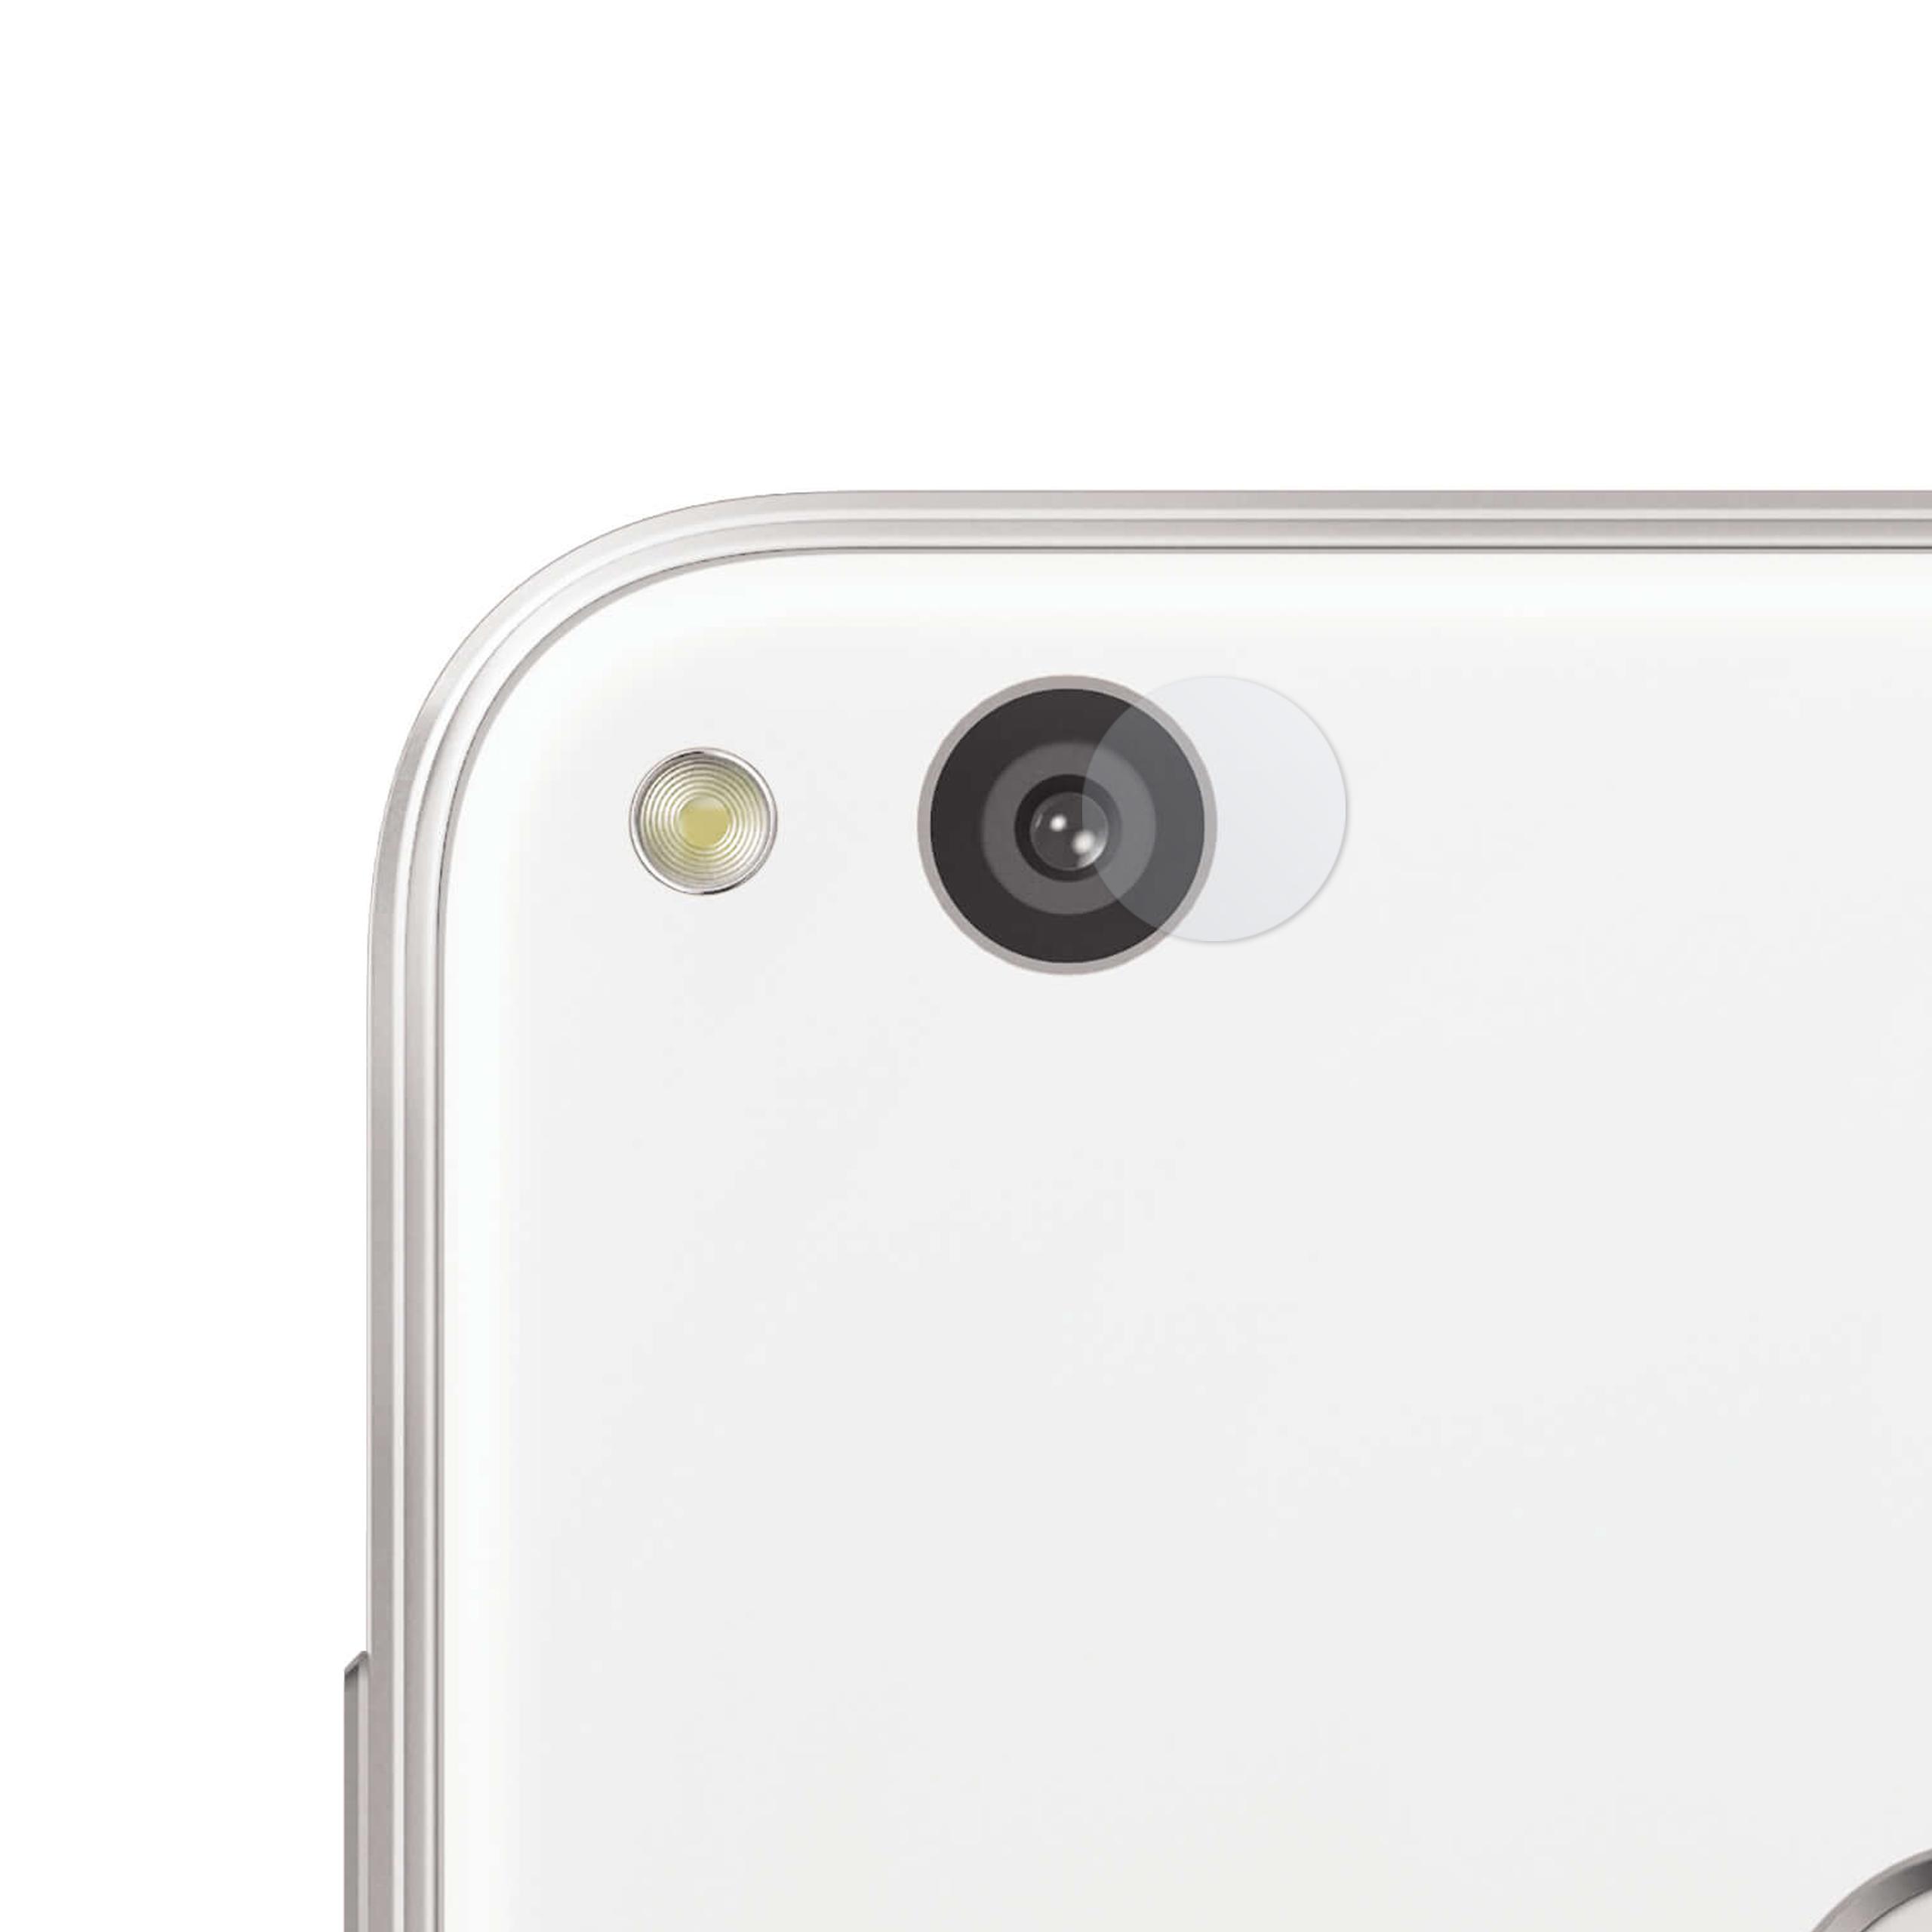 Huawei P8 Lite 2017 Kameraschutz Panzerglas Folie